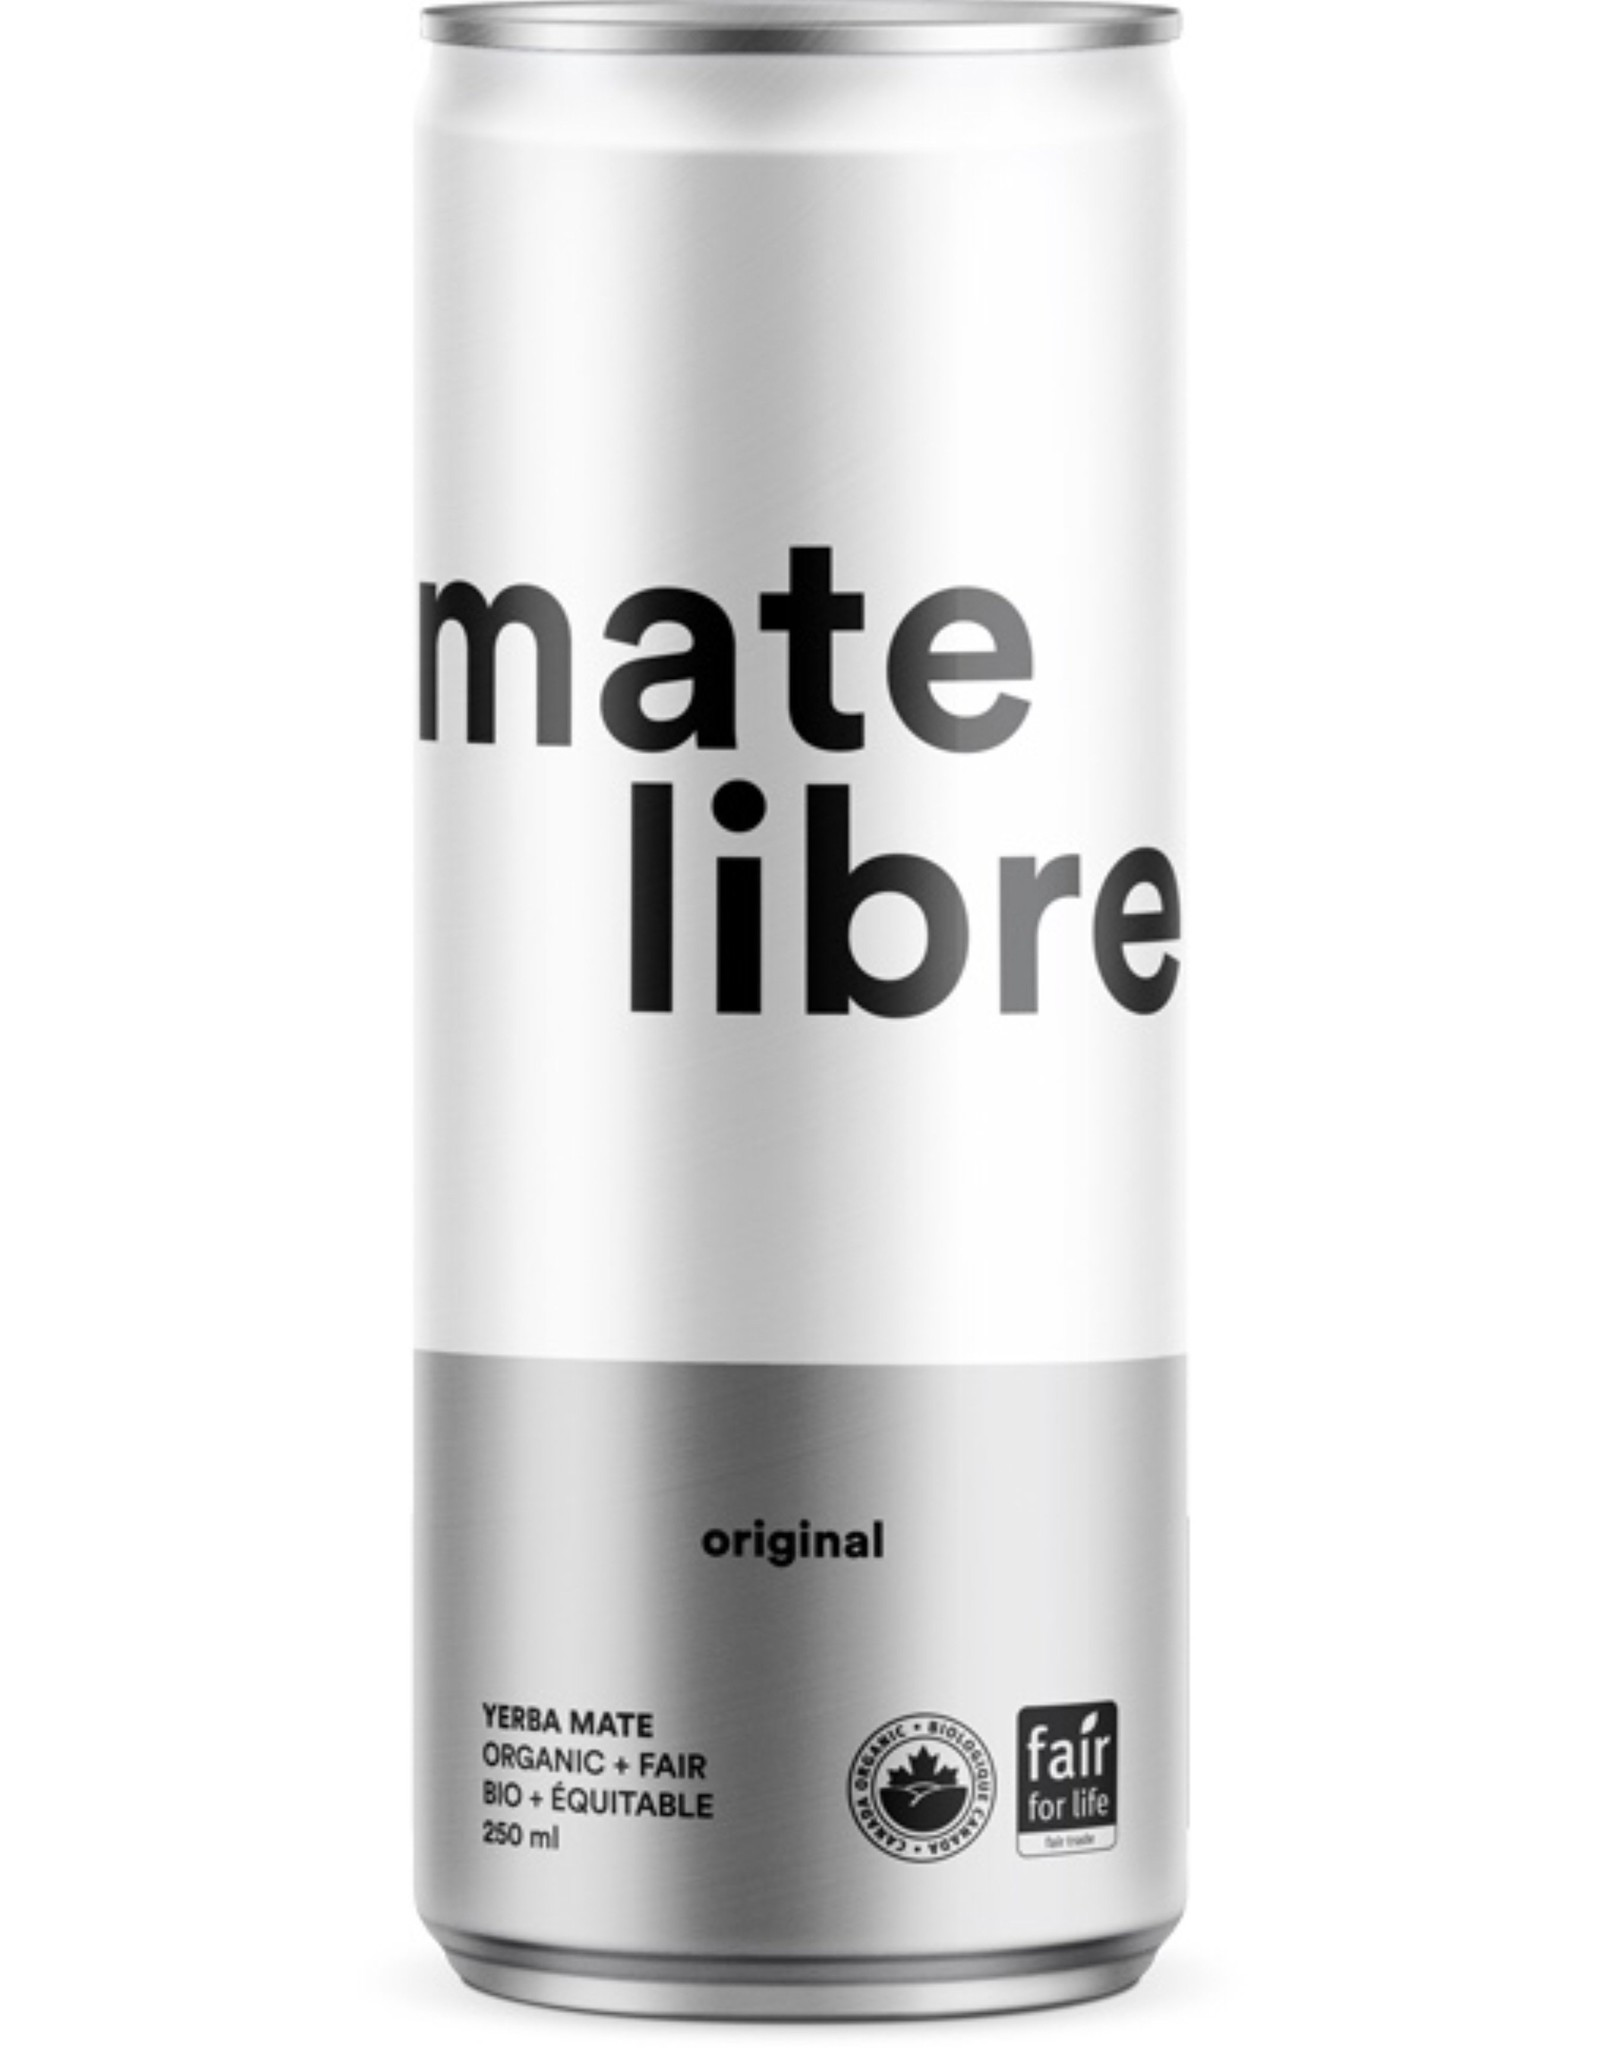 Mate Libre Mate Libre - Boisson de Yerba Maté, Originale (250ml)